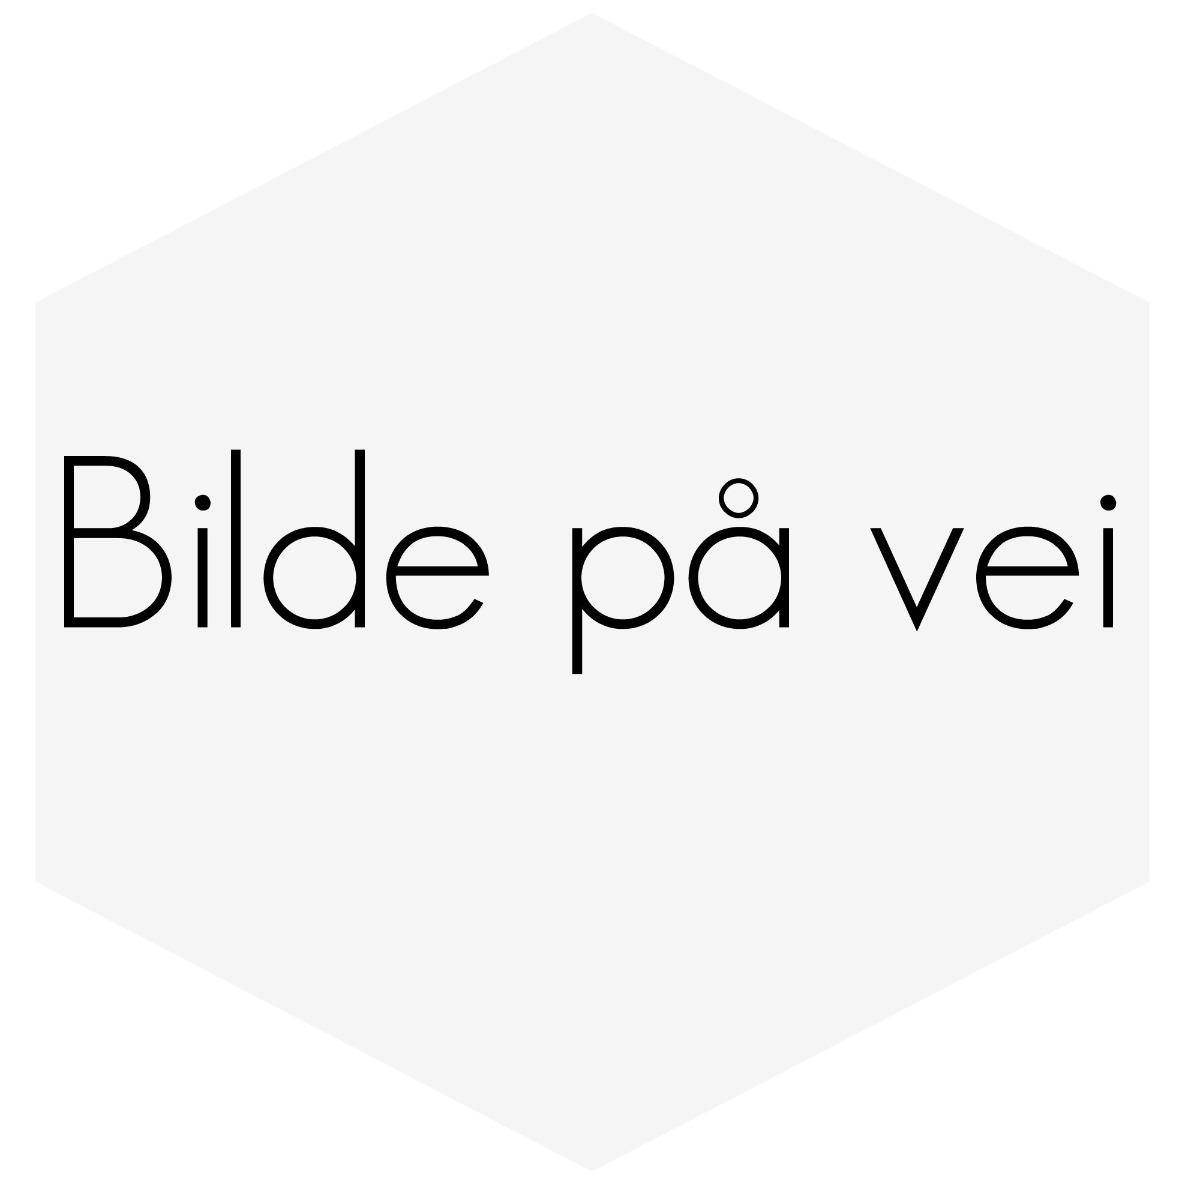 SKVETTLAPP SATS TIL VOLVO V70 00-